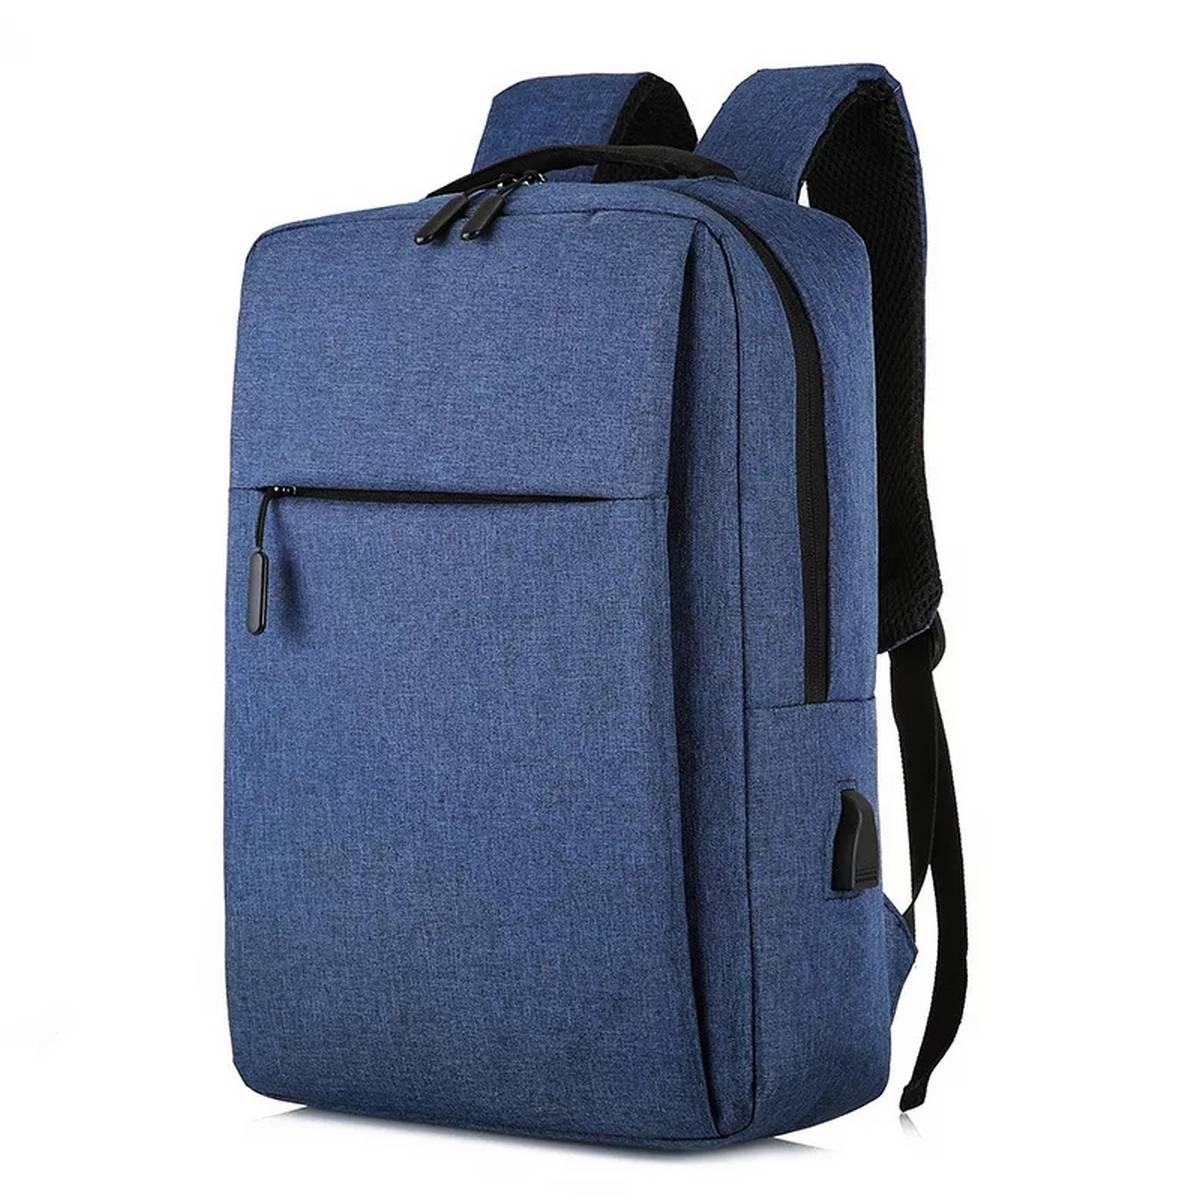 Men/Women 14inch Eminent Nylon Notebook Business Laptop Backpack Bag